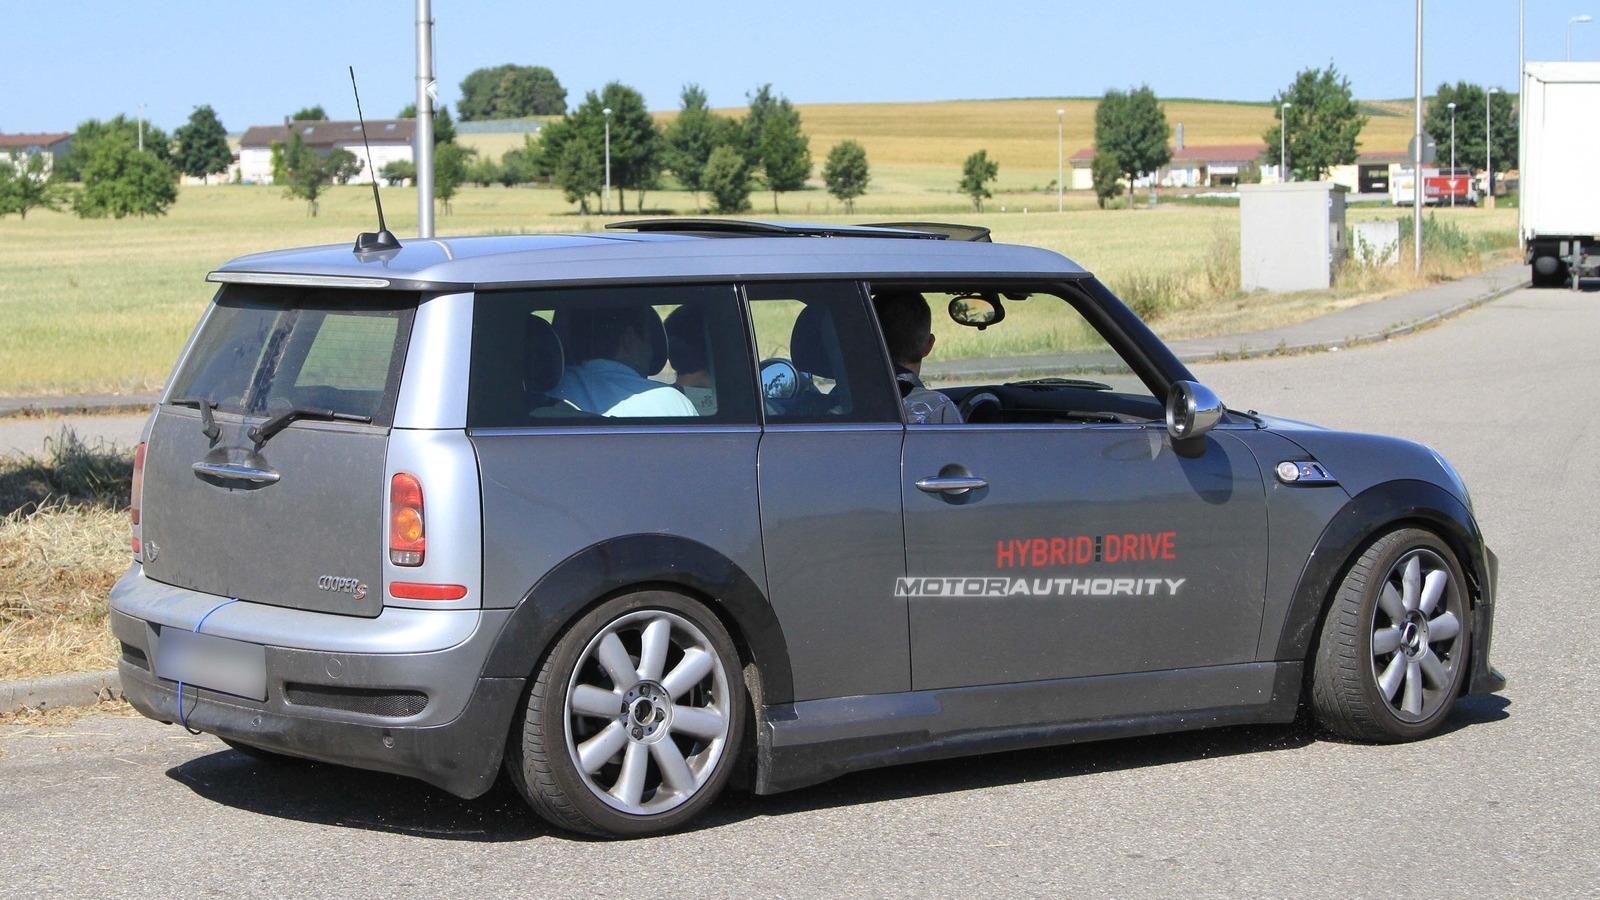 MINI Clubman S Hybrid spy shots